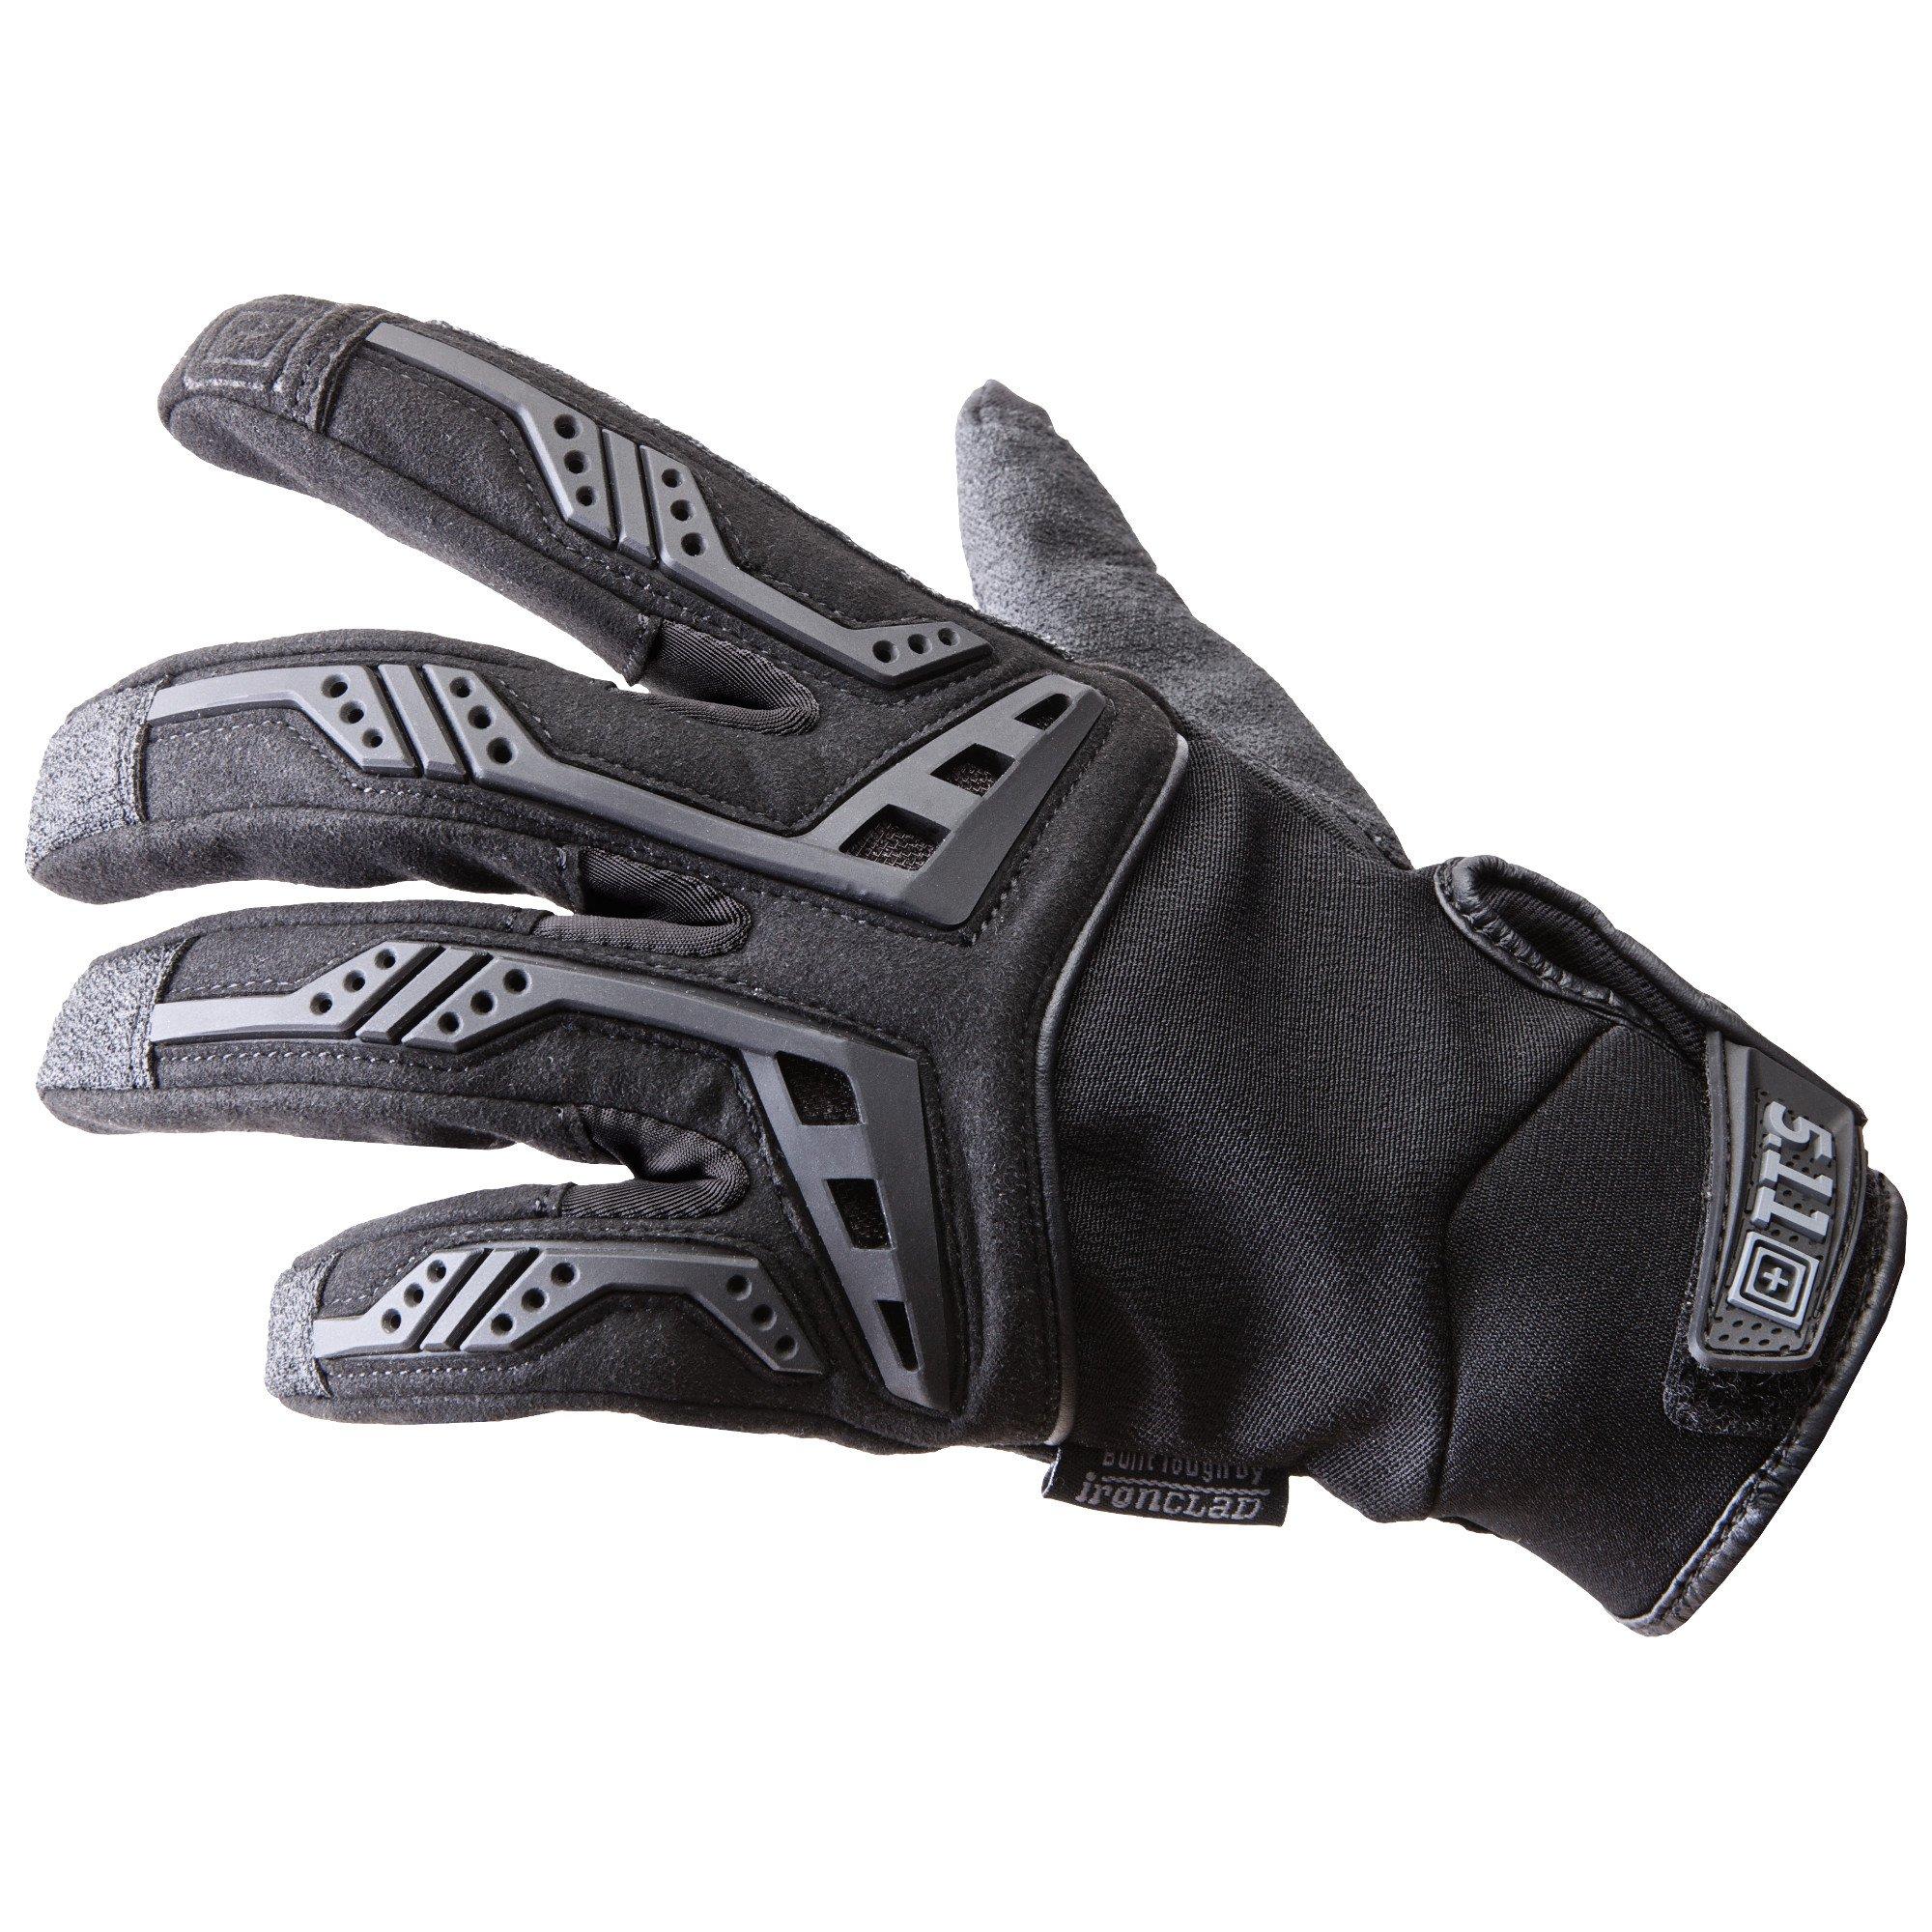 Scene One Glove